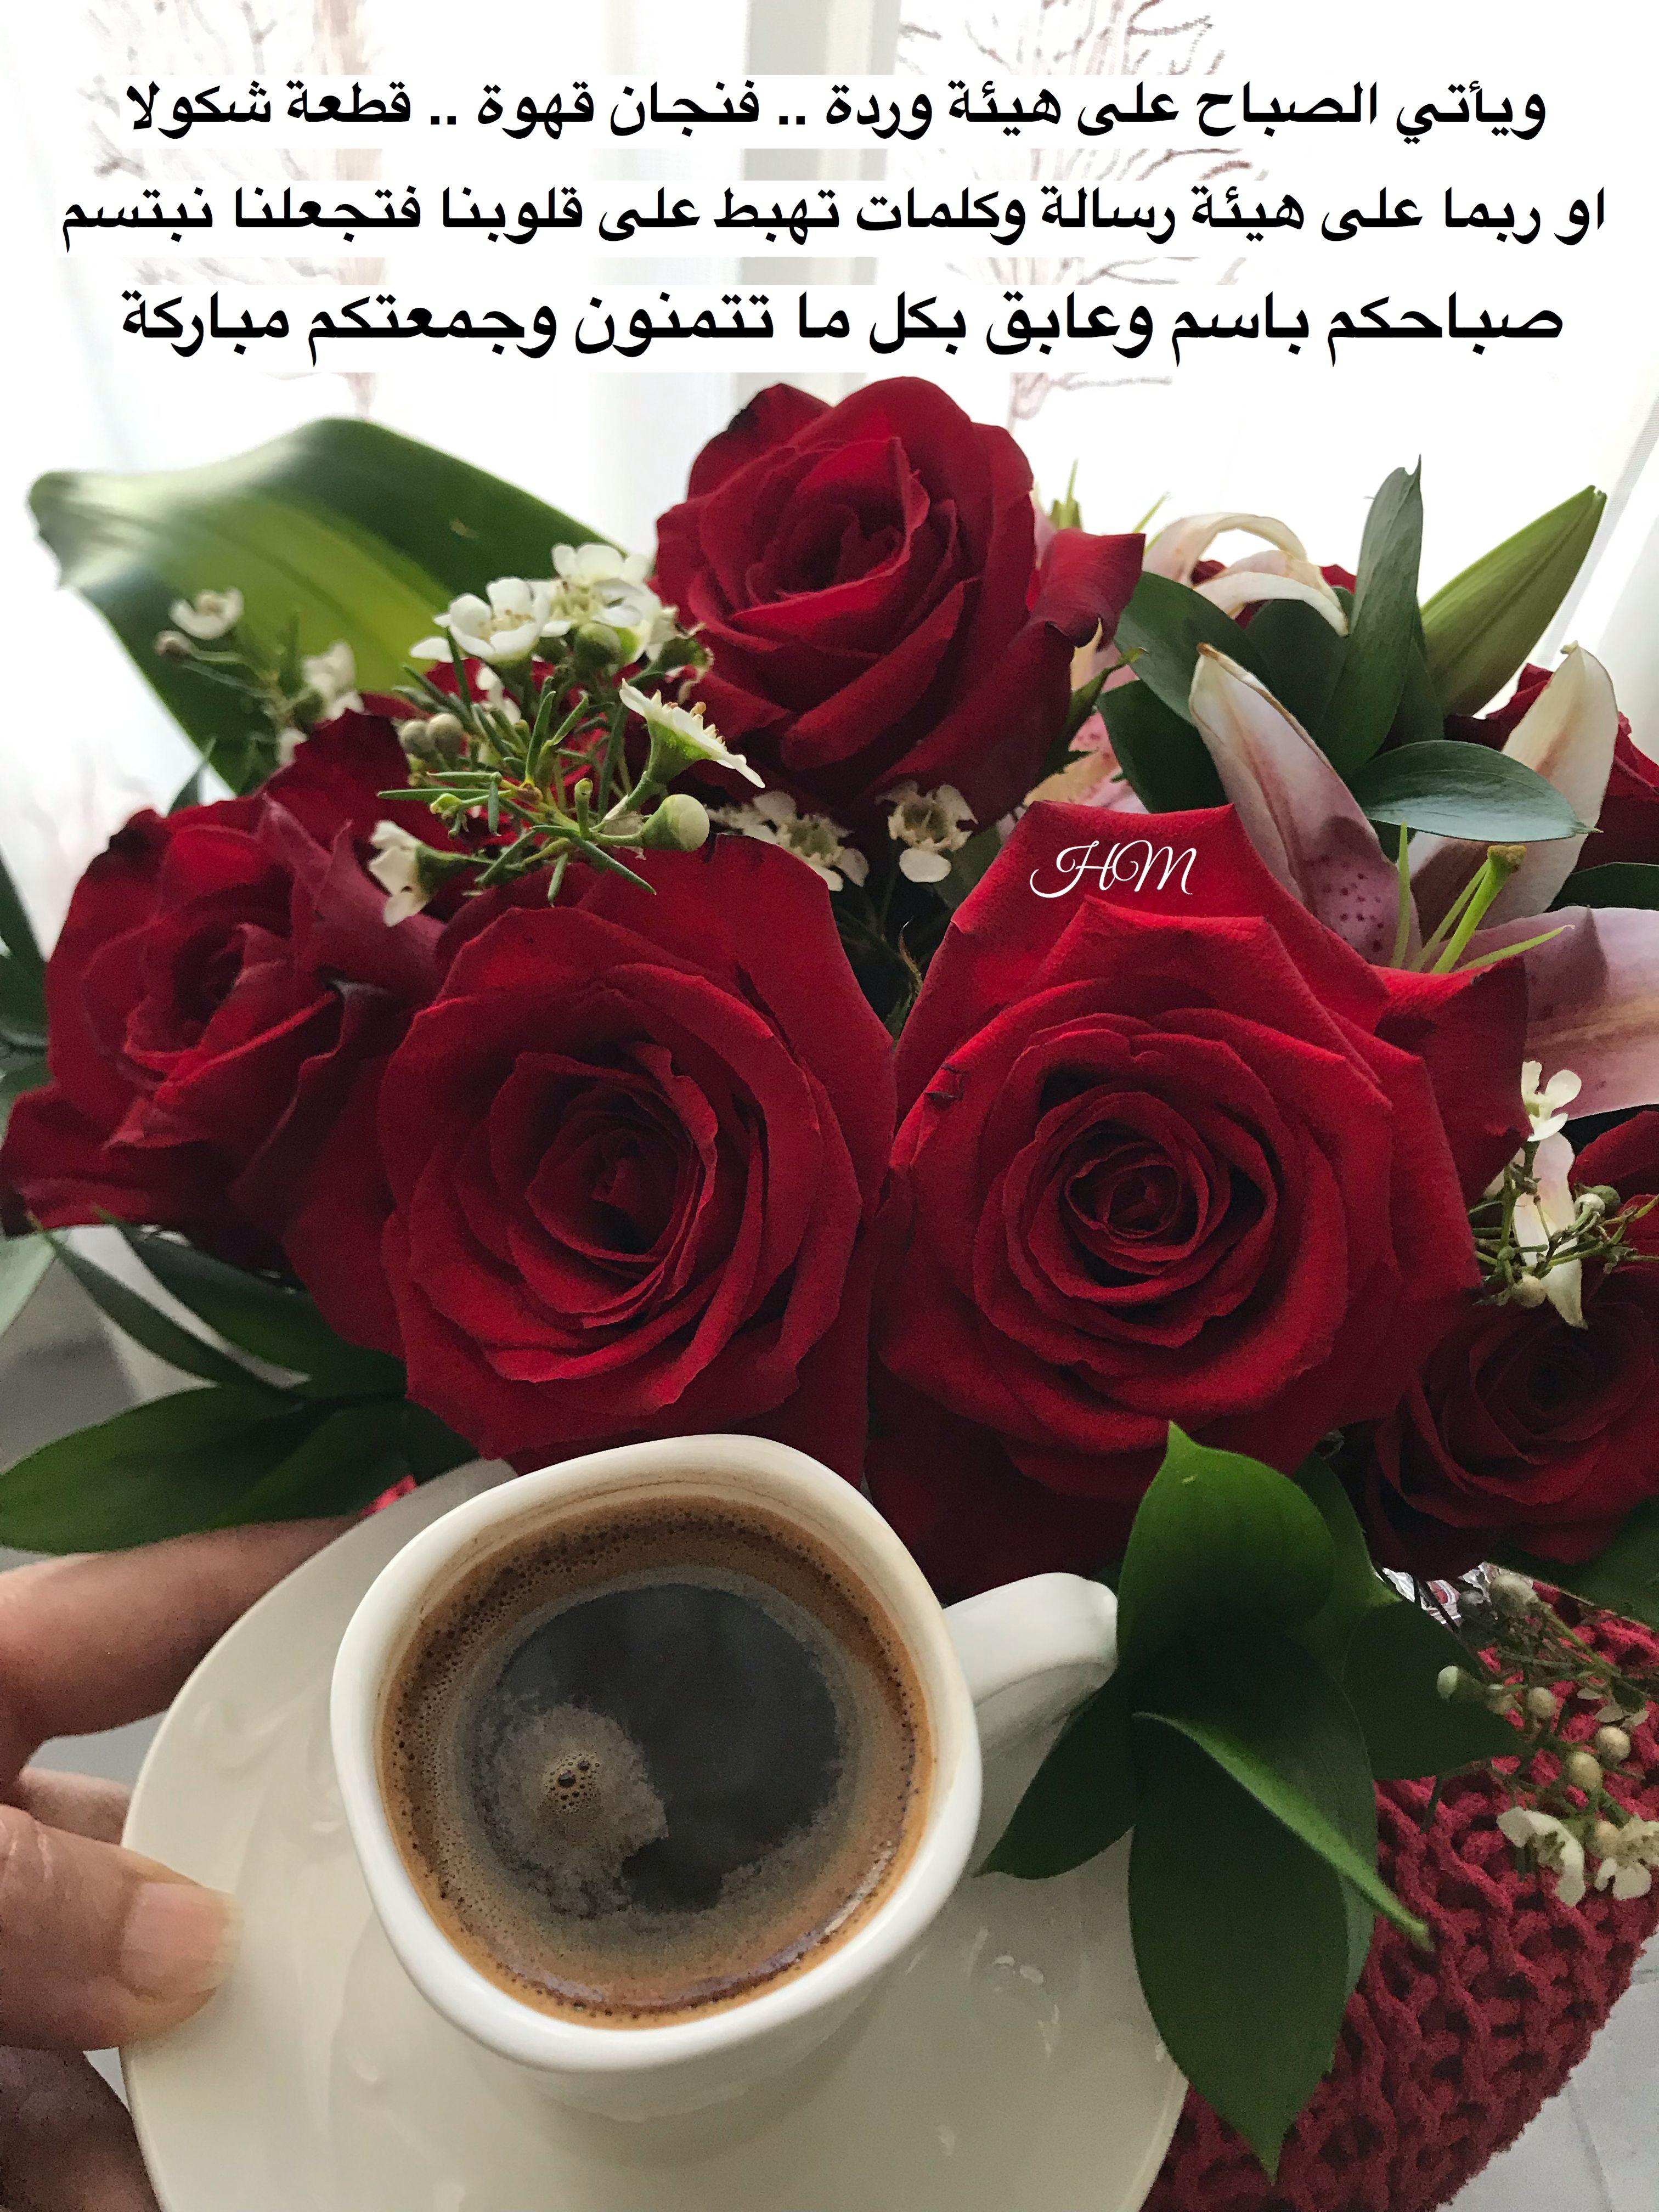 Pin By Janete Alves De Oliveira On الصباح على كيف كيفي Good Morning Gif Beautiful Moon Islamic Quotes